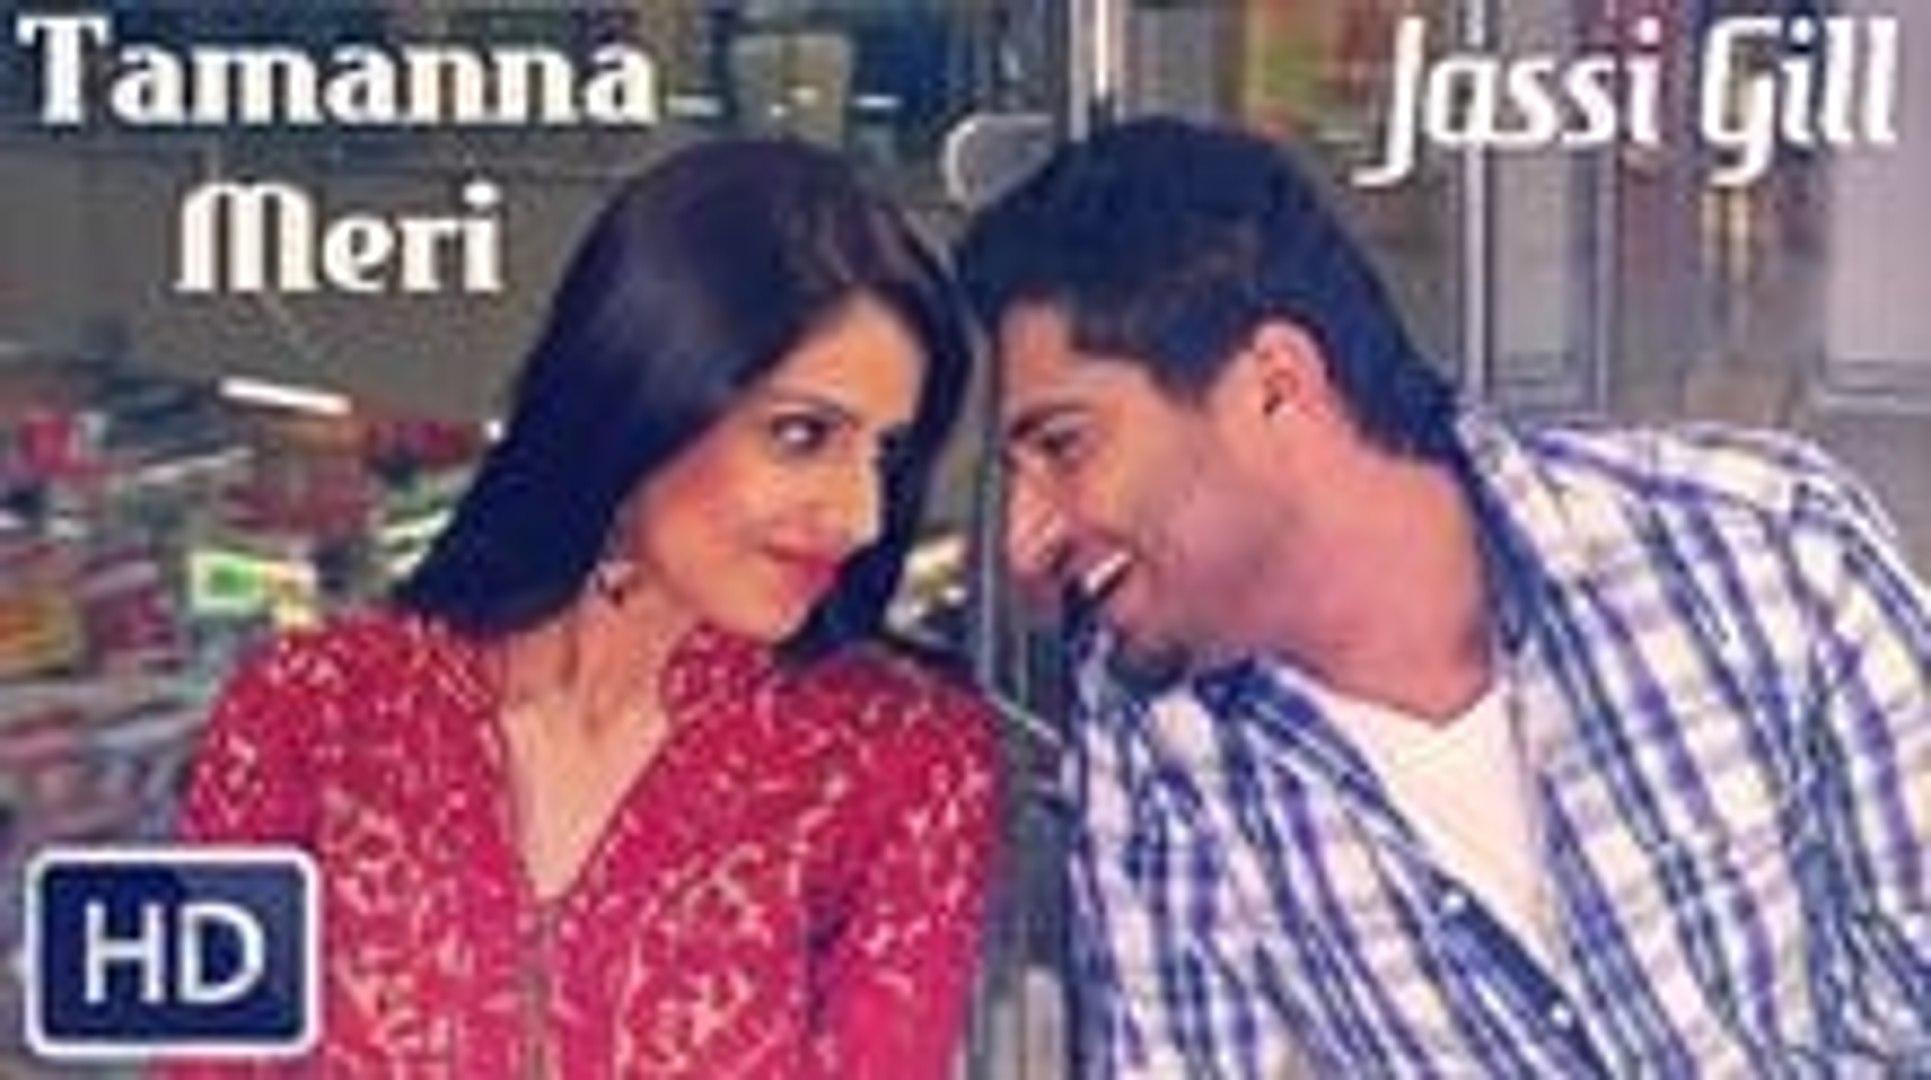 Tamanna Meri (Full Video) Jassi Gill - Dil Vil Pyaar Vyaar - New Punjabi  Songs 2014 HD